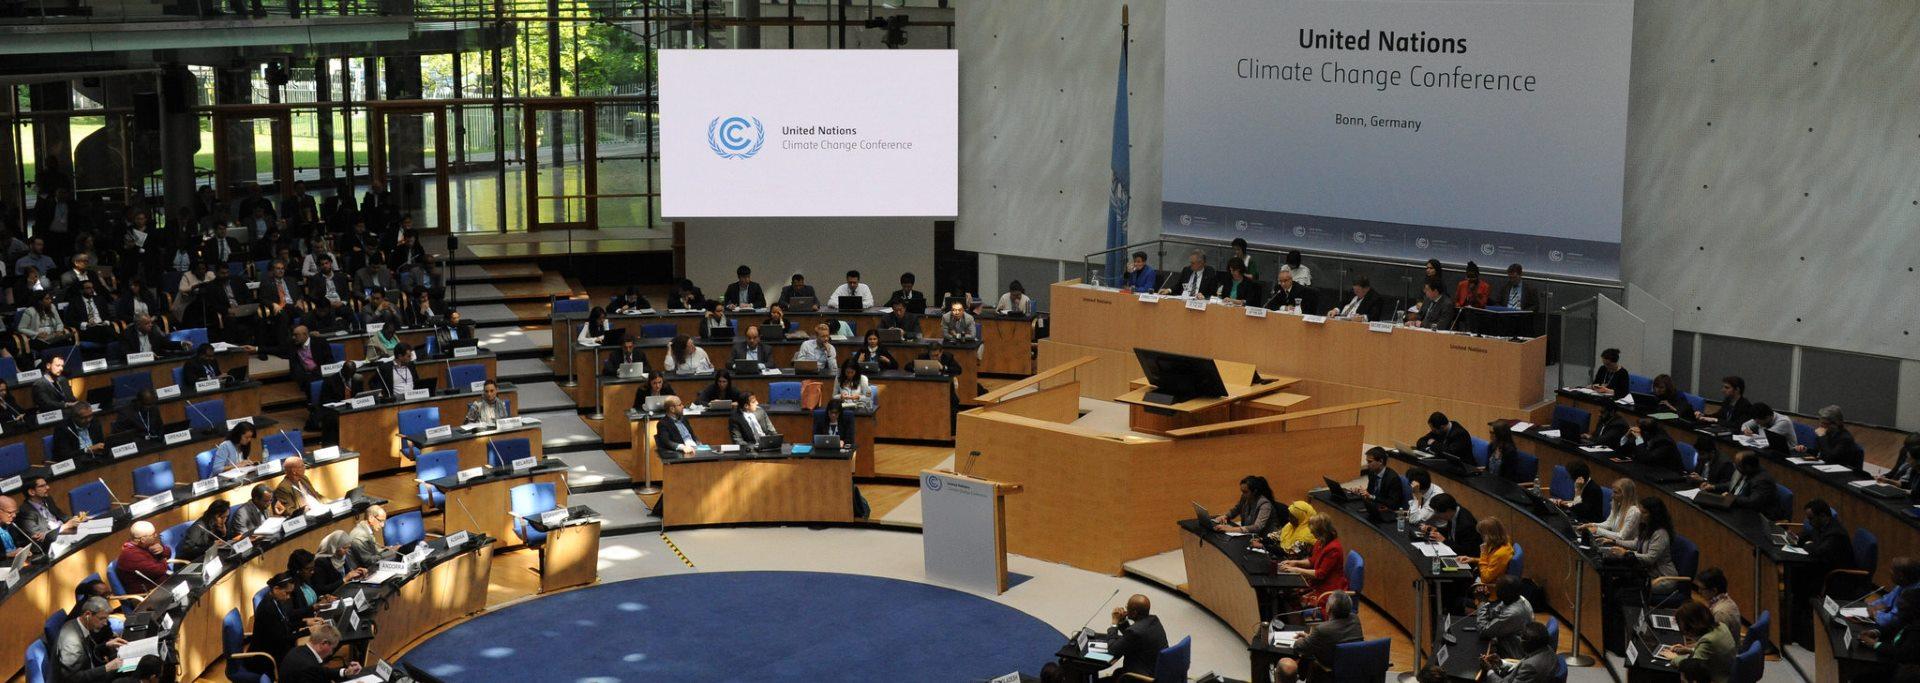 UNFCCC-cropped.jpg